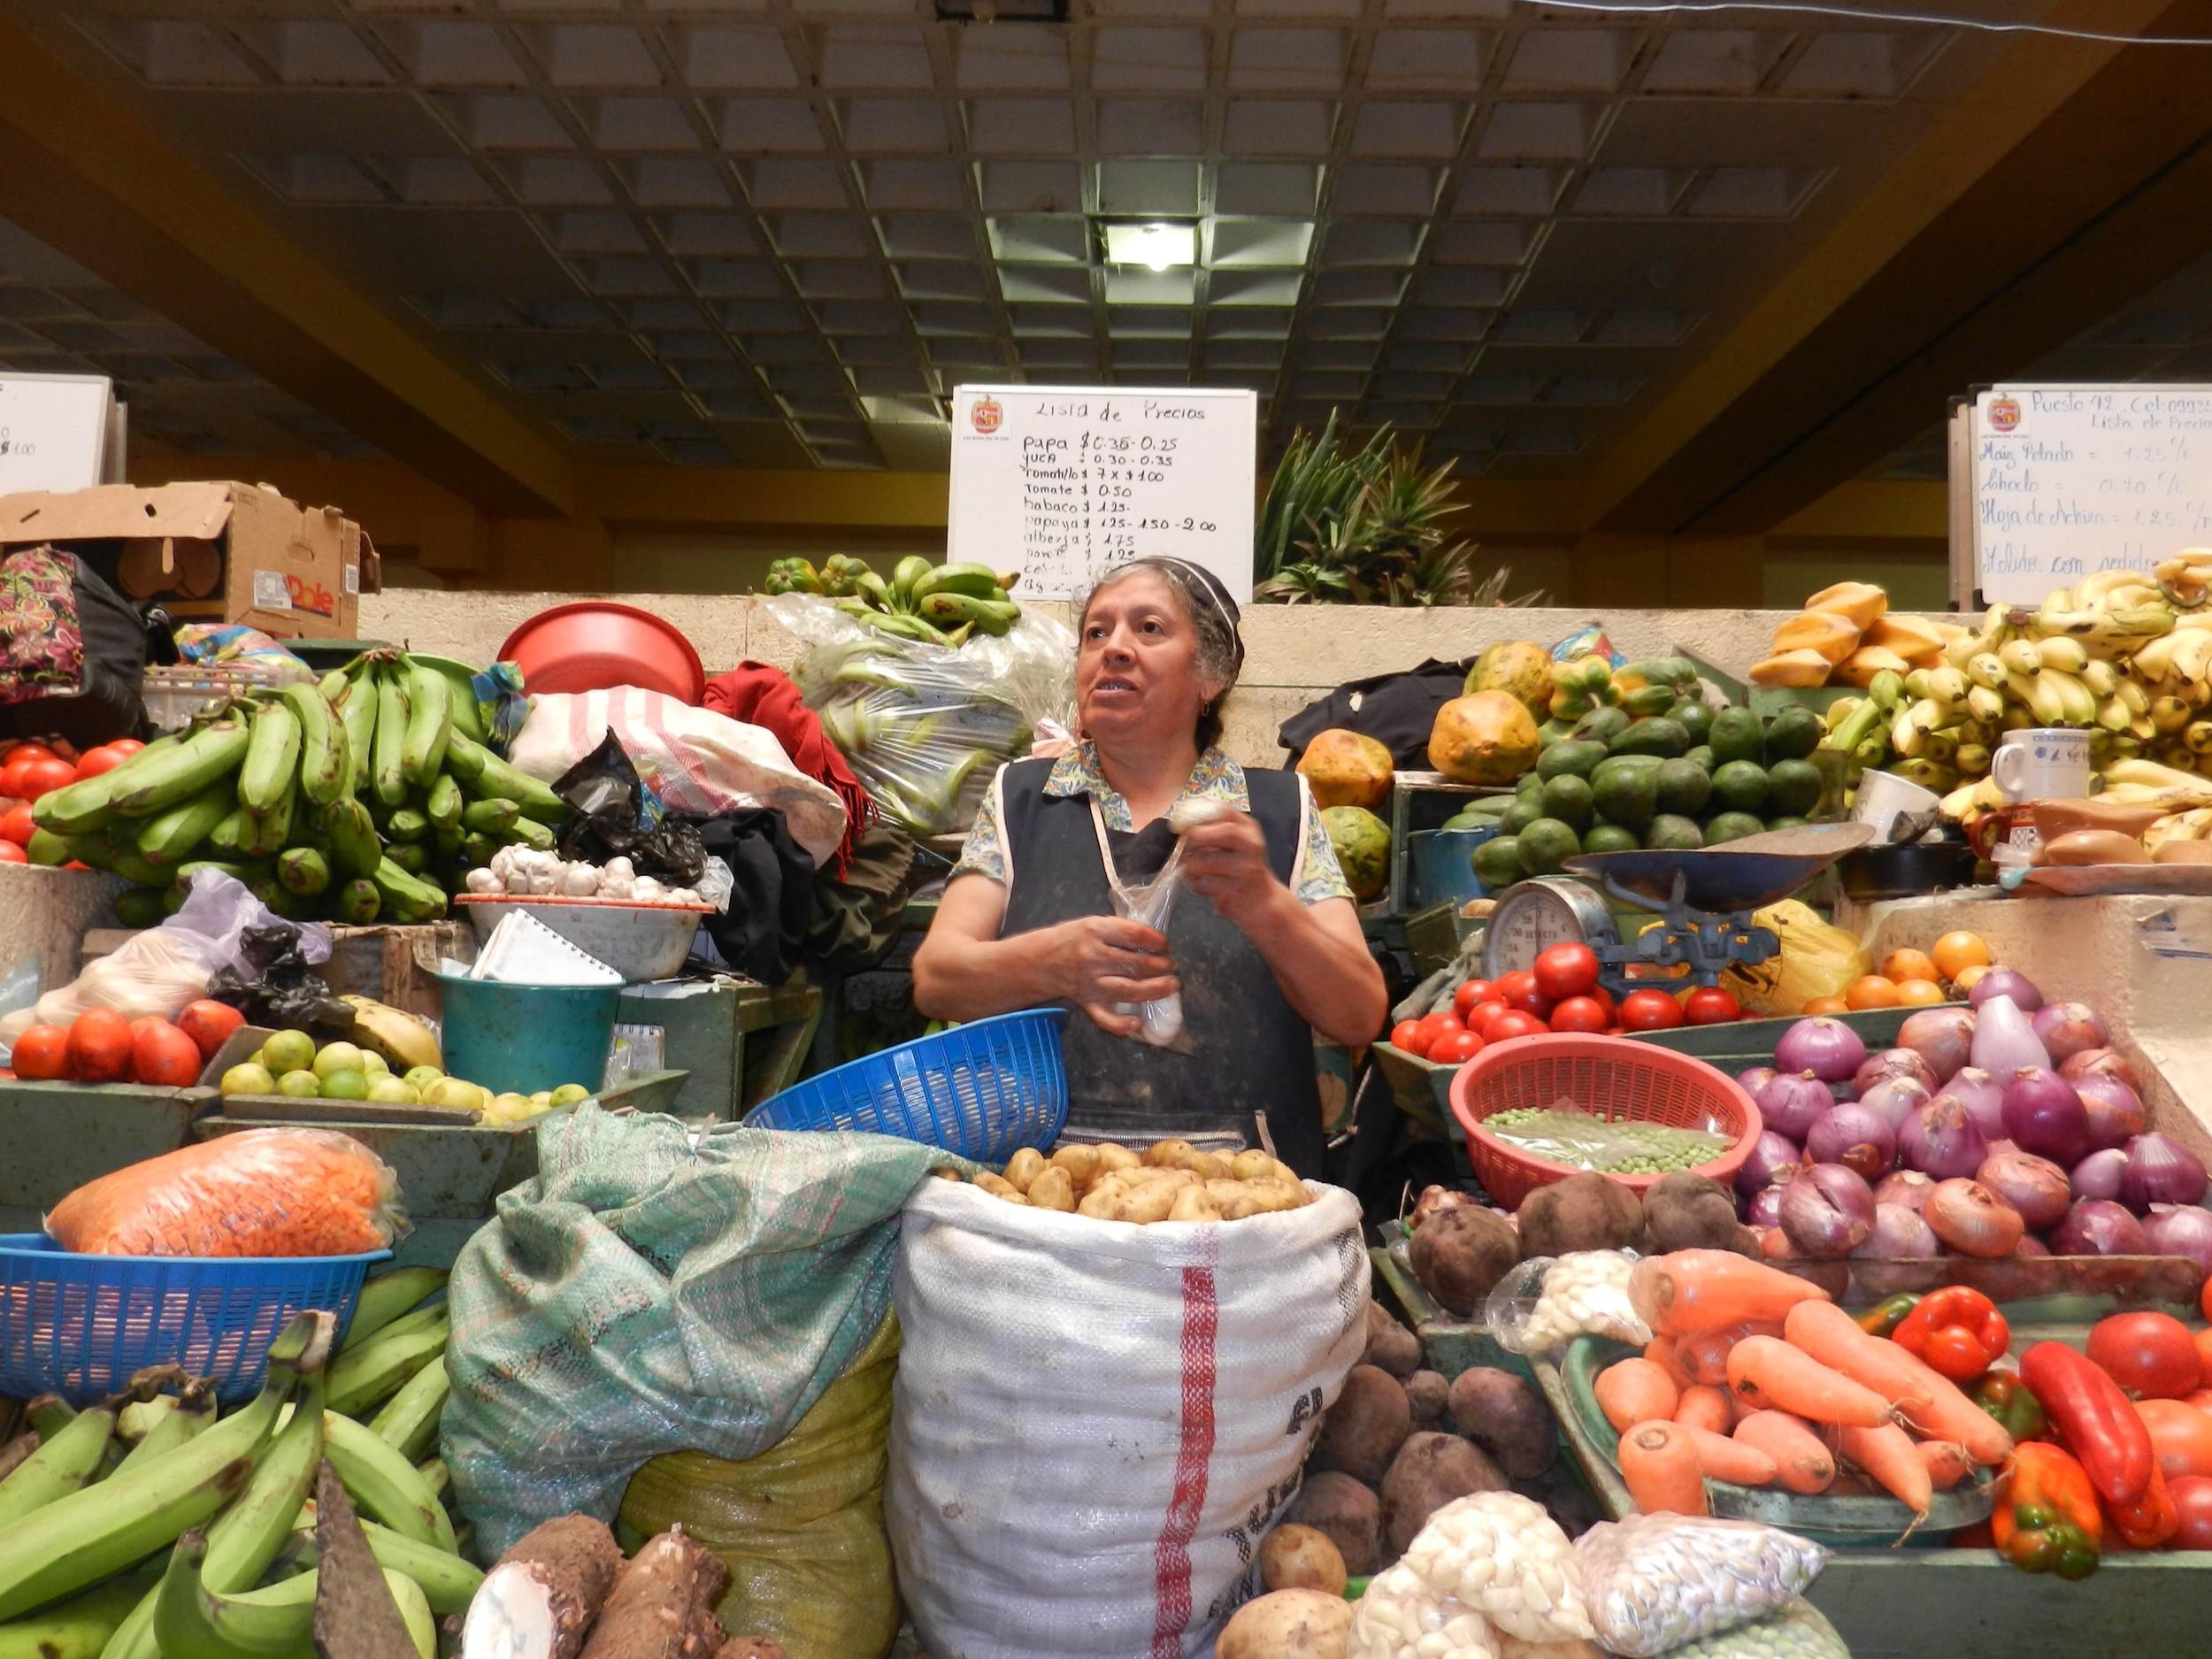 The Market in Loja, Ecuador